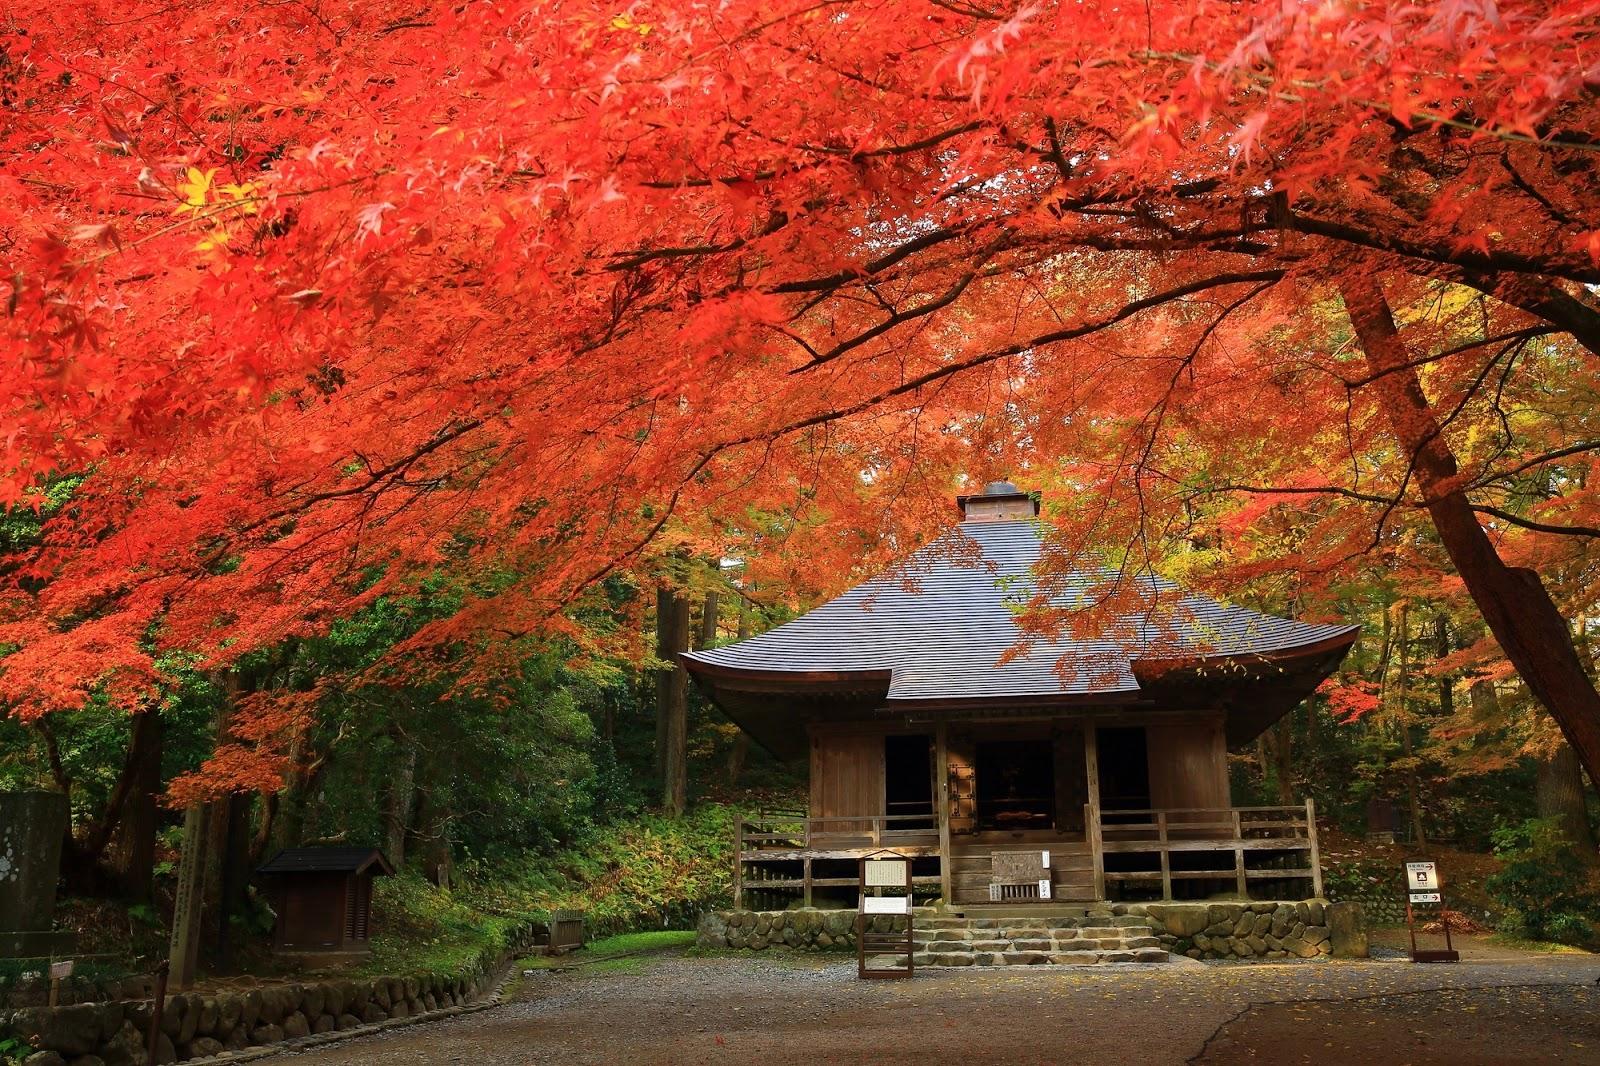 Autumn tugo - in Japan - BlogFanArt